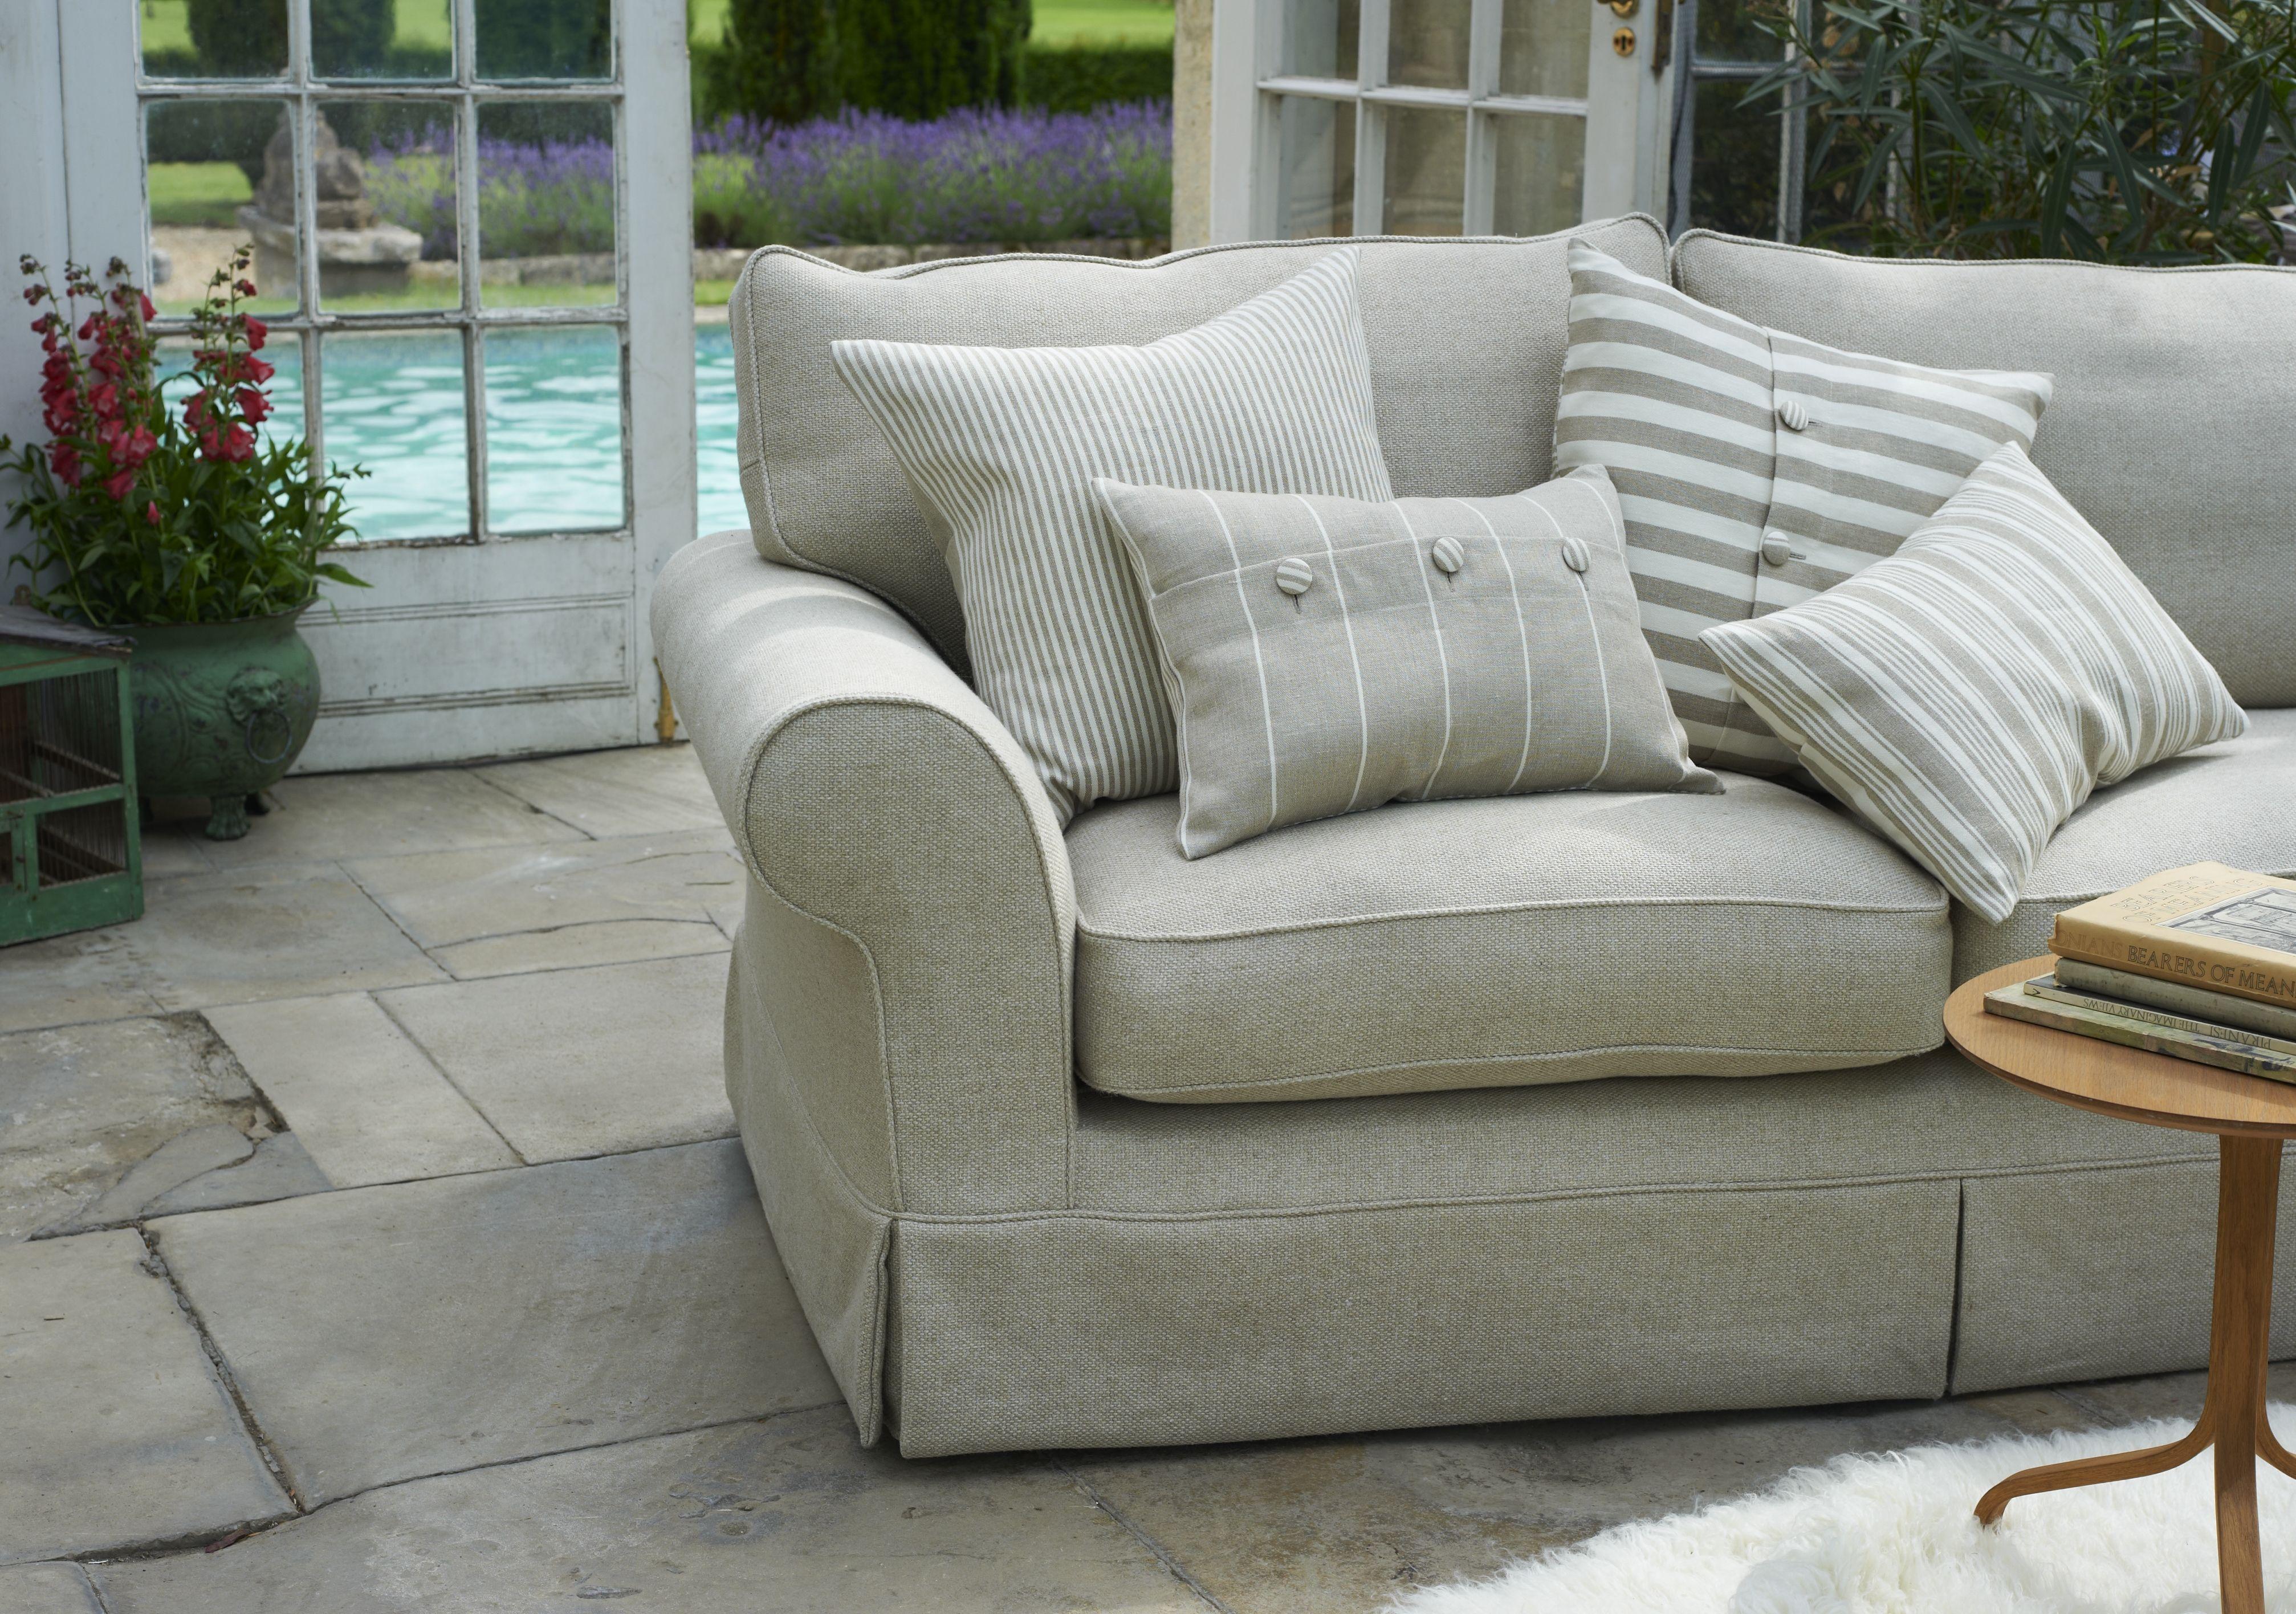 Good The Clambin Two And A Half Seat Sofa In Herringbone £1,080 Http://